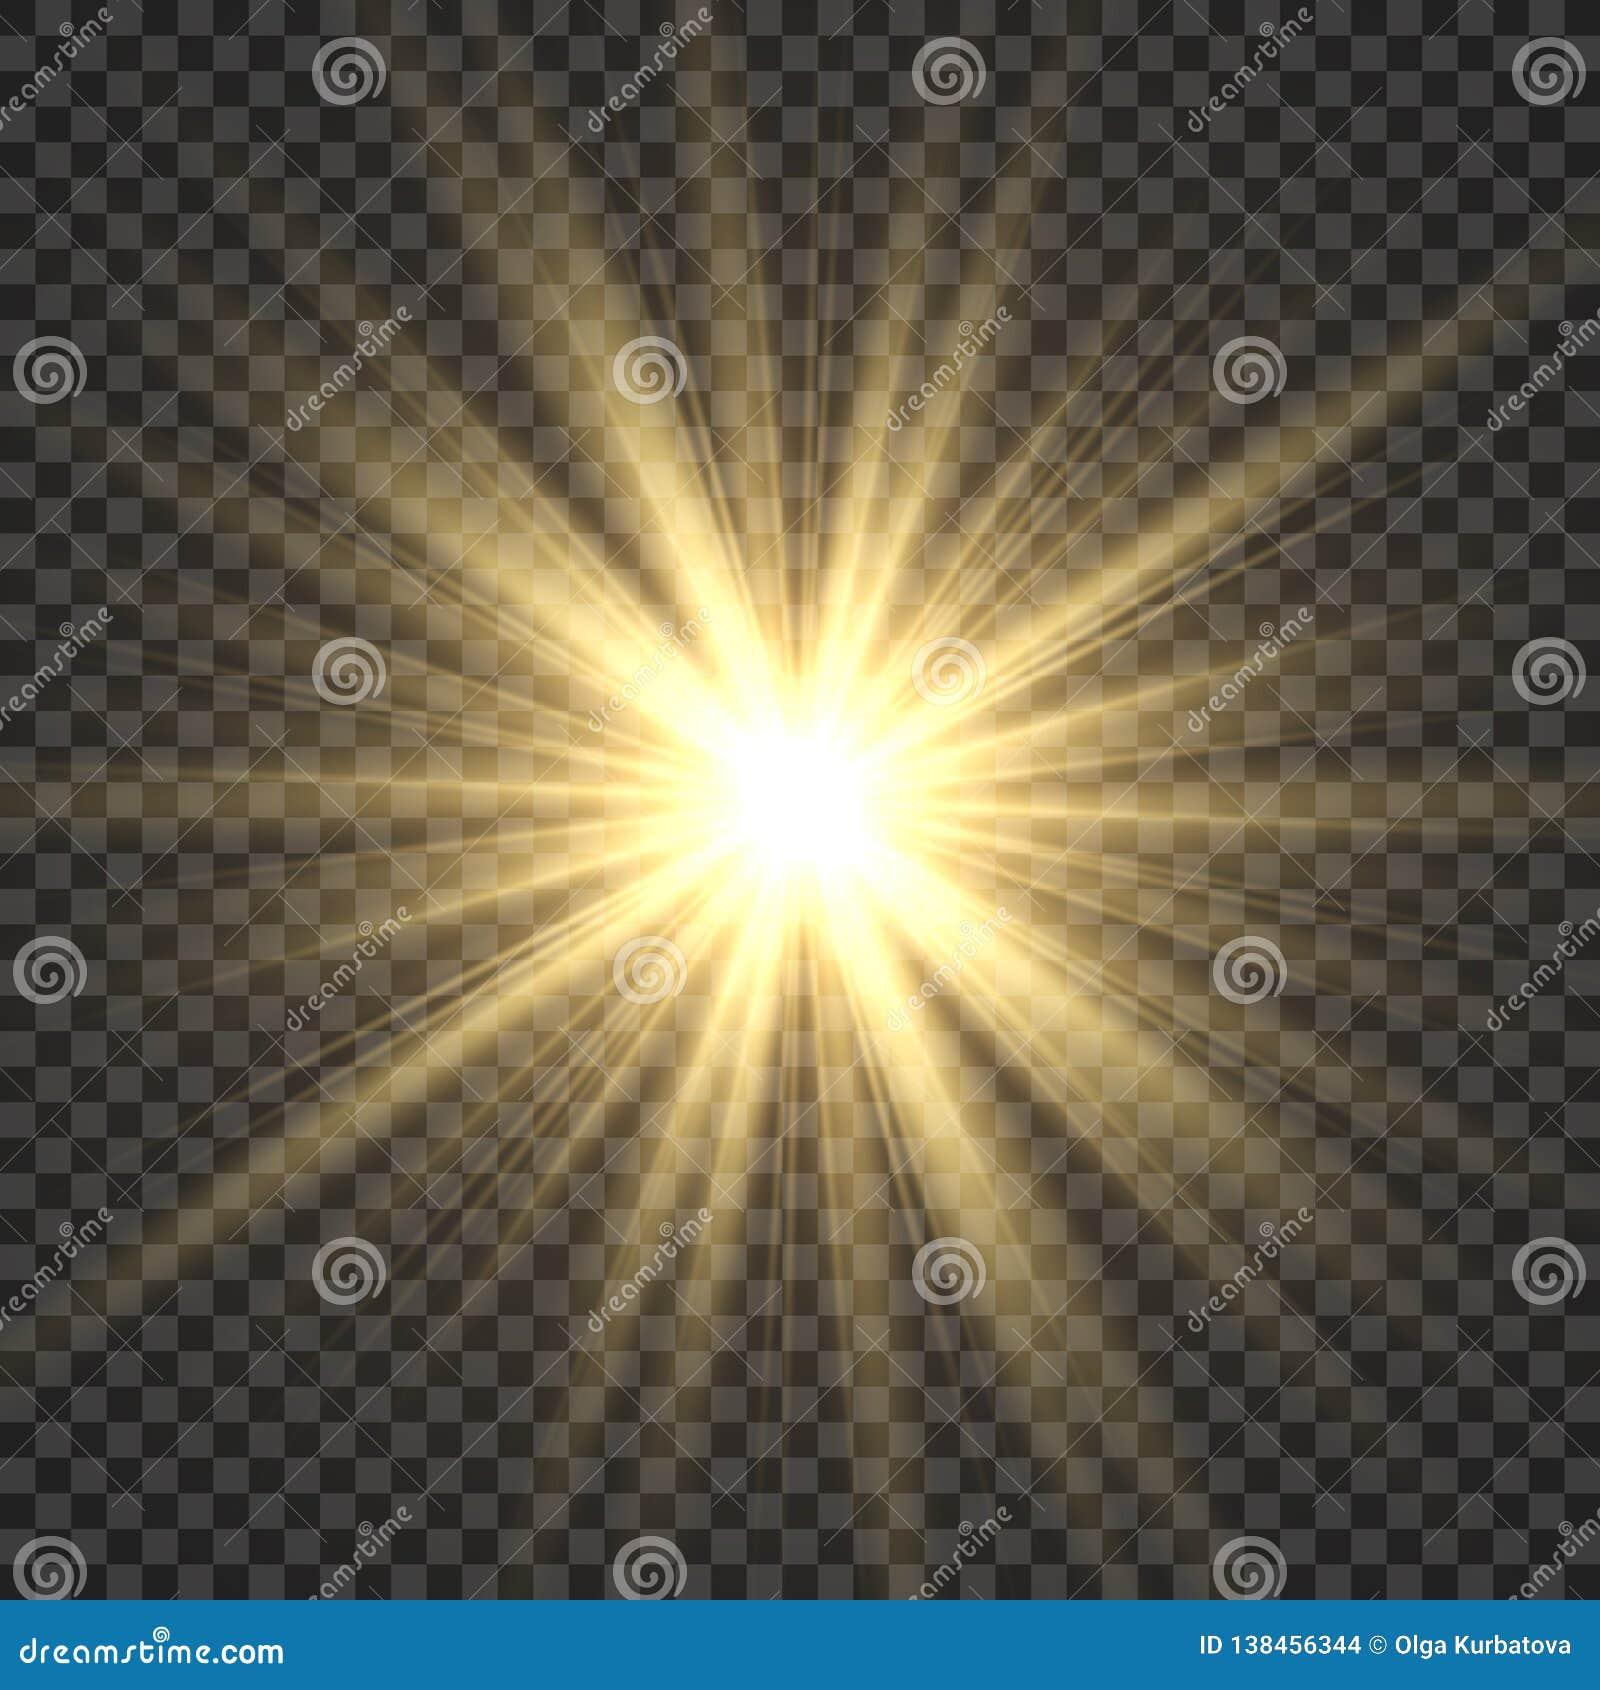 Realistic sun rays. Yellow sun ray glow abstract shine light effect starburst sbeam sunshine glowing isolated image